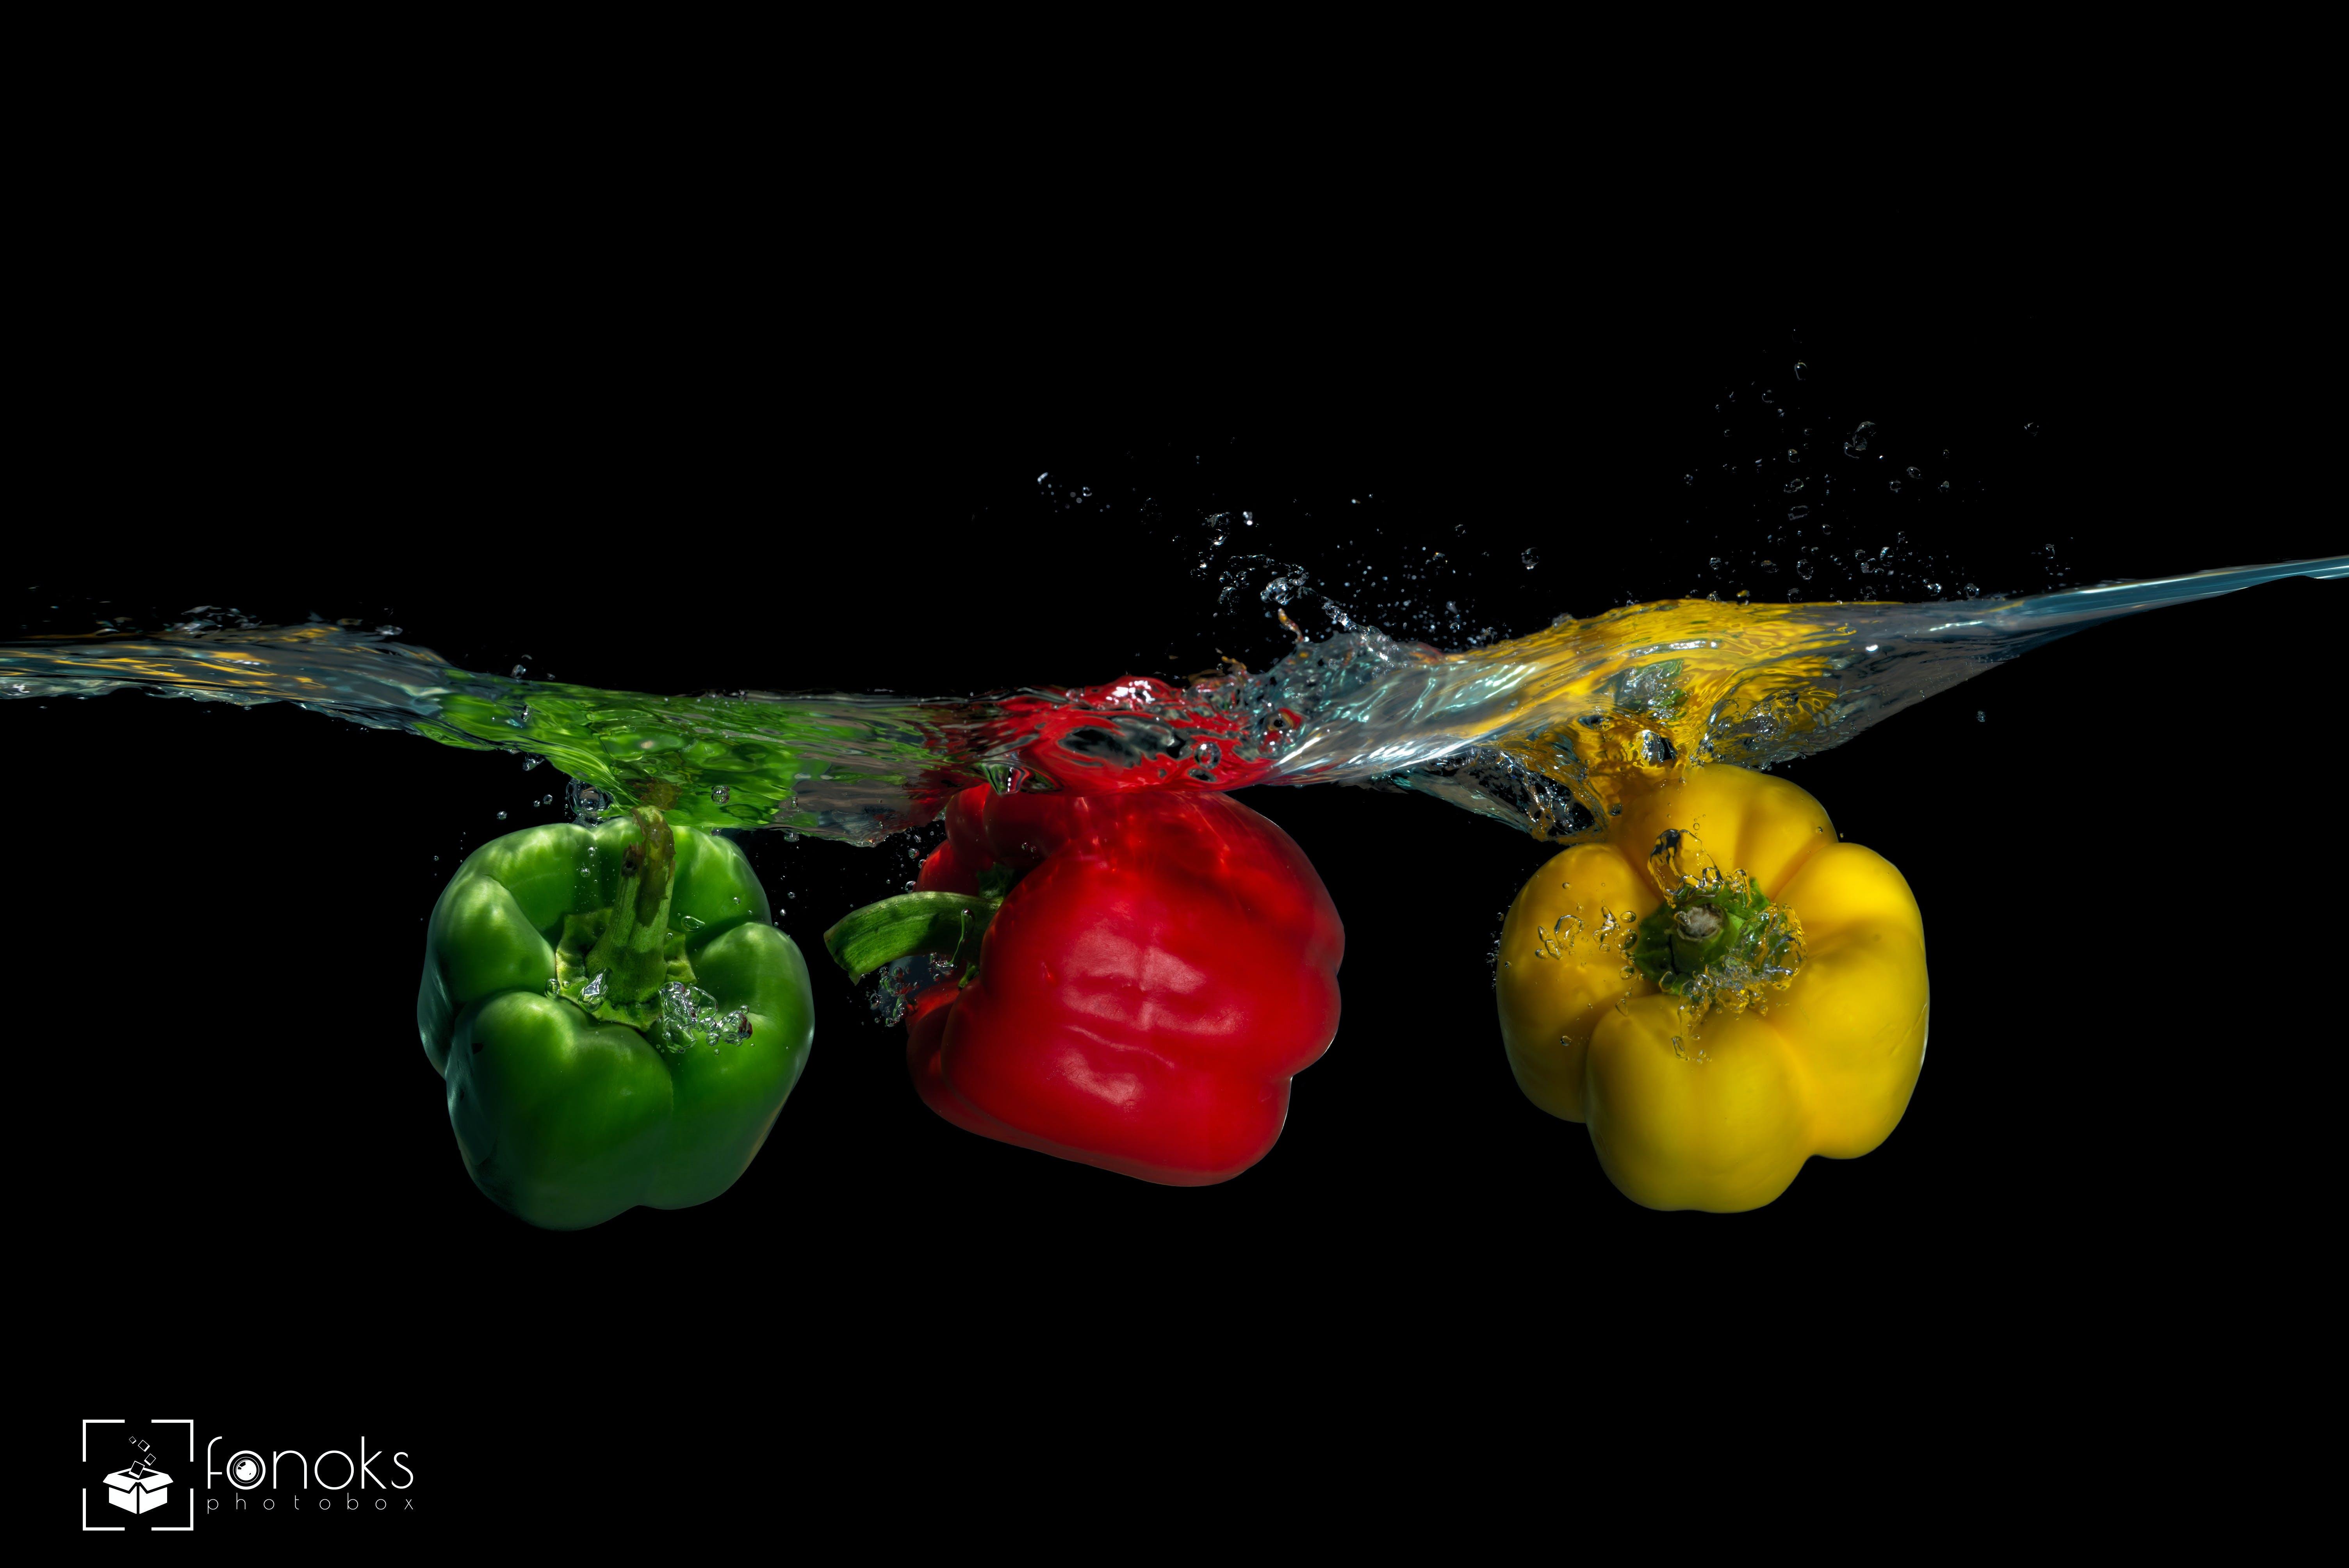 Free stock photo of #FonoksPhotobox, #food, #foodblogger, #foodlove